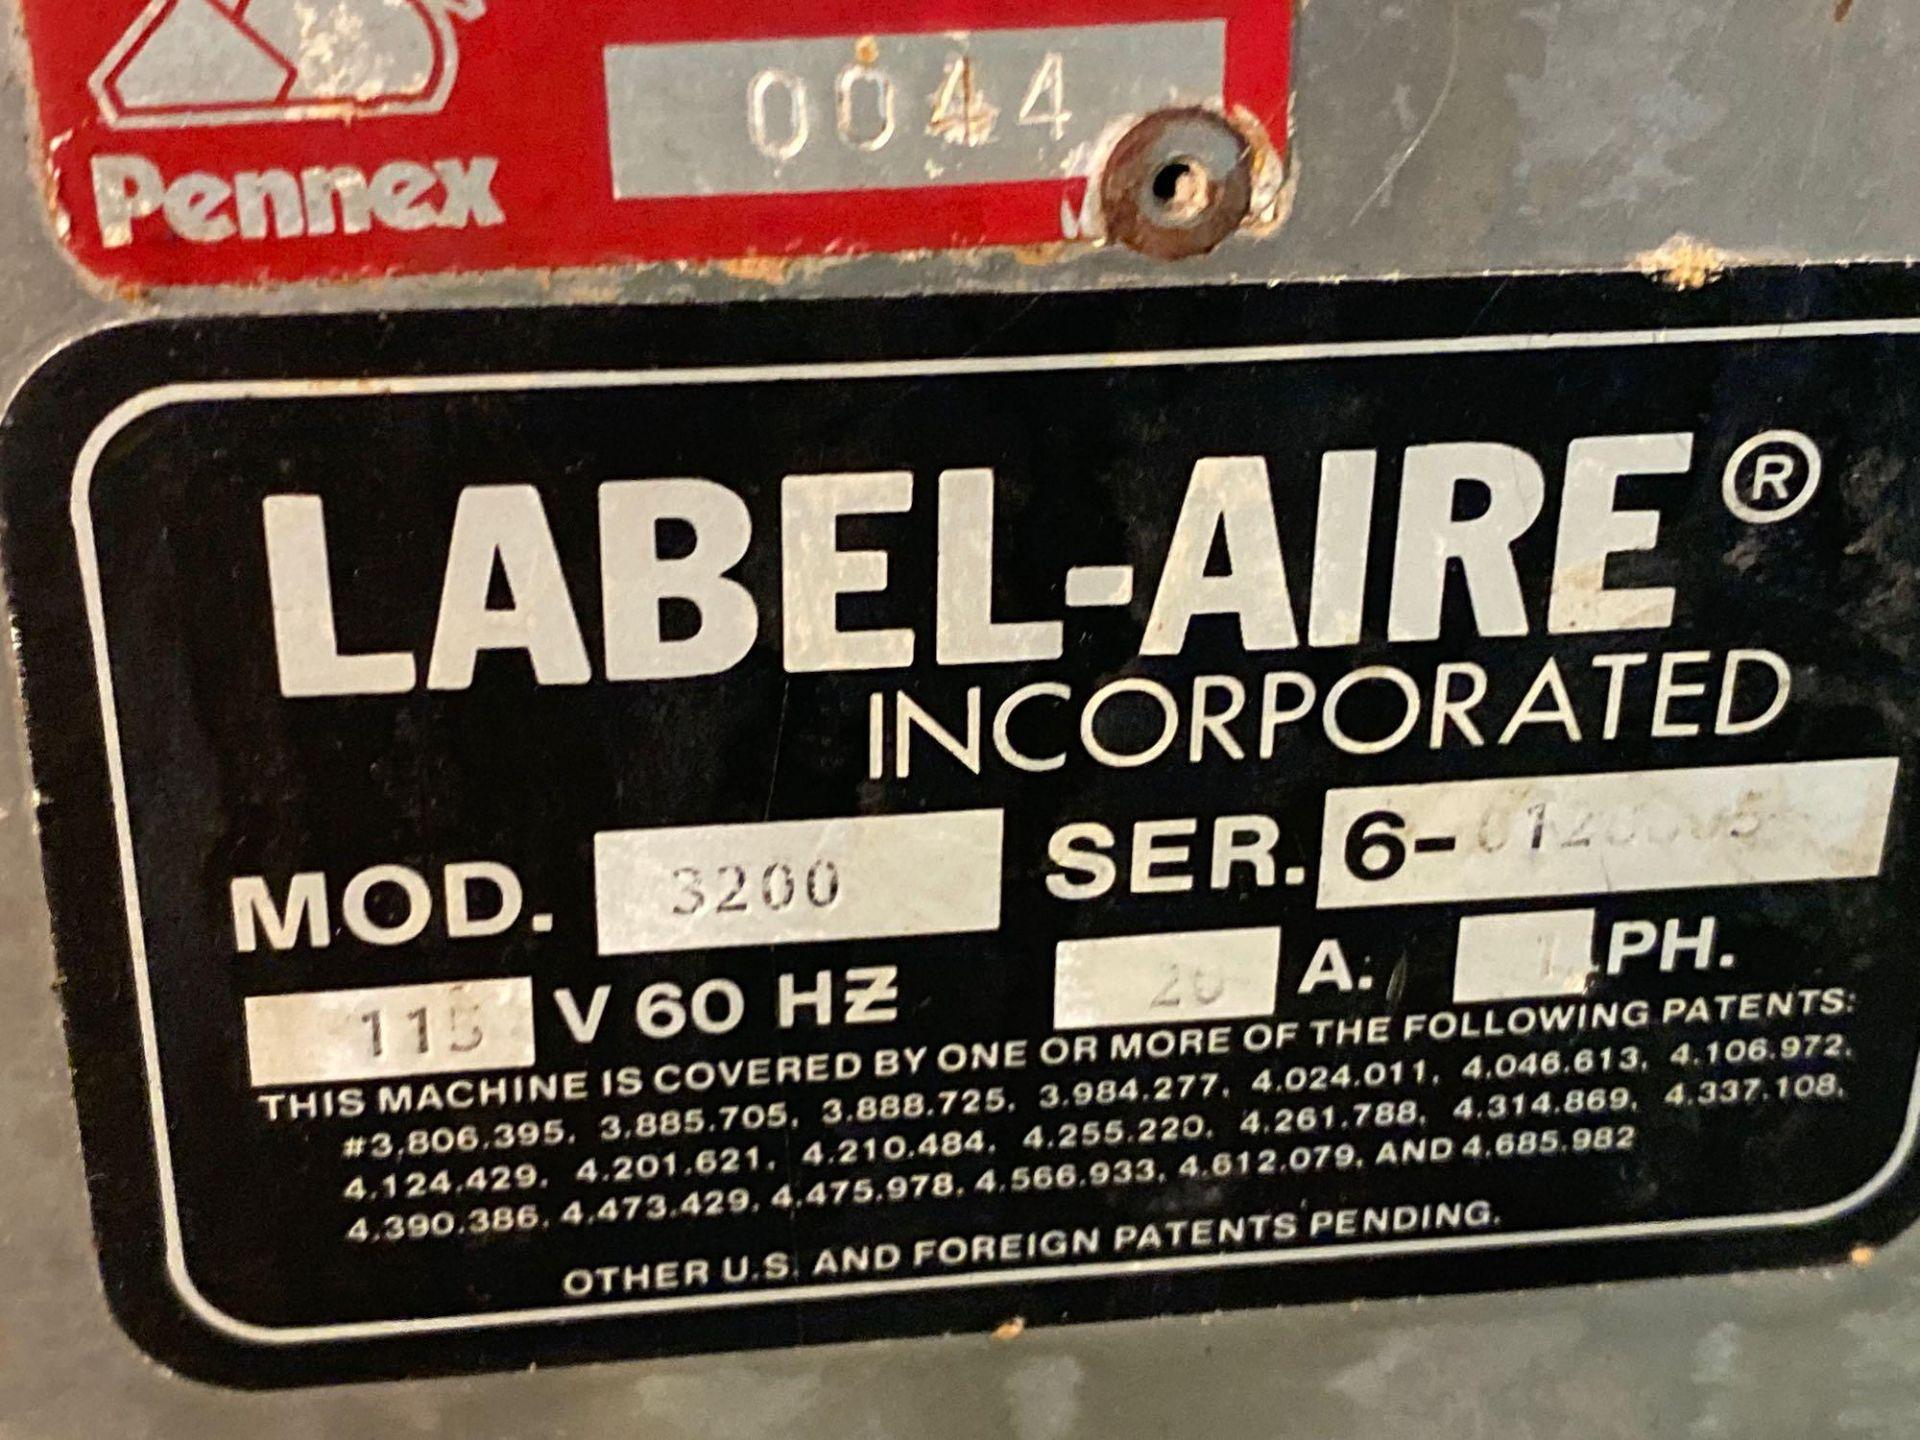 Label-Aire Model 3200 Conveyorized Pressure Sensitive Labeler - Image 5 of 14